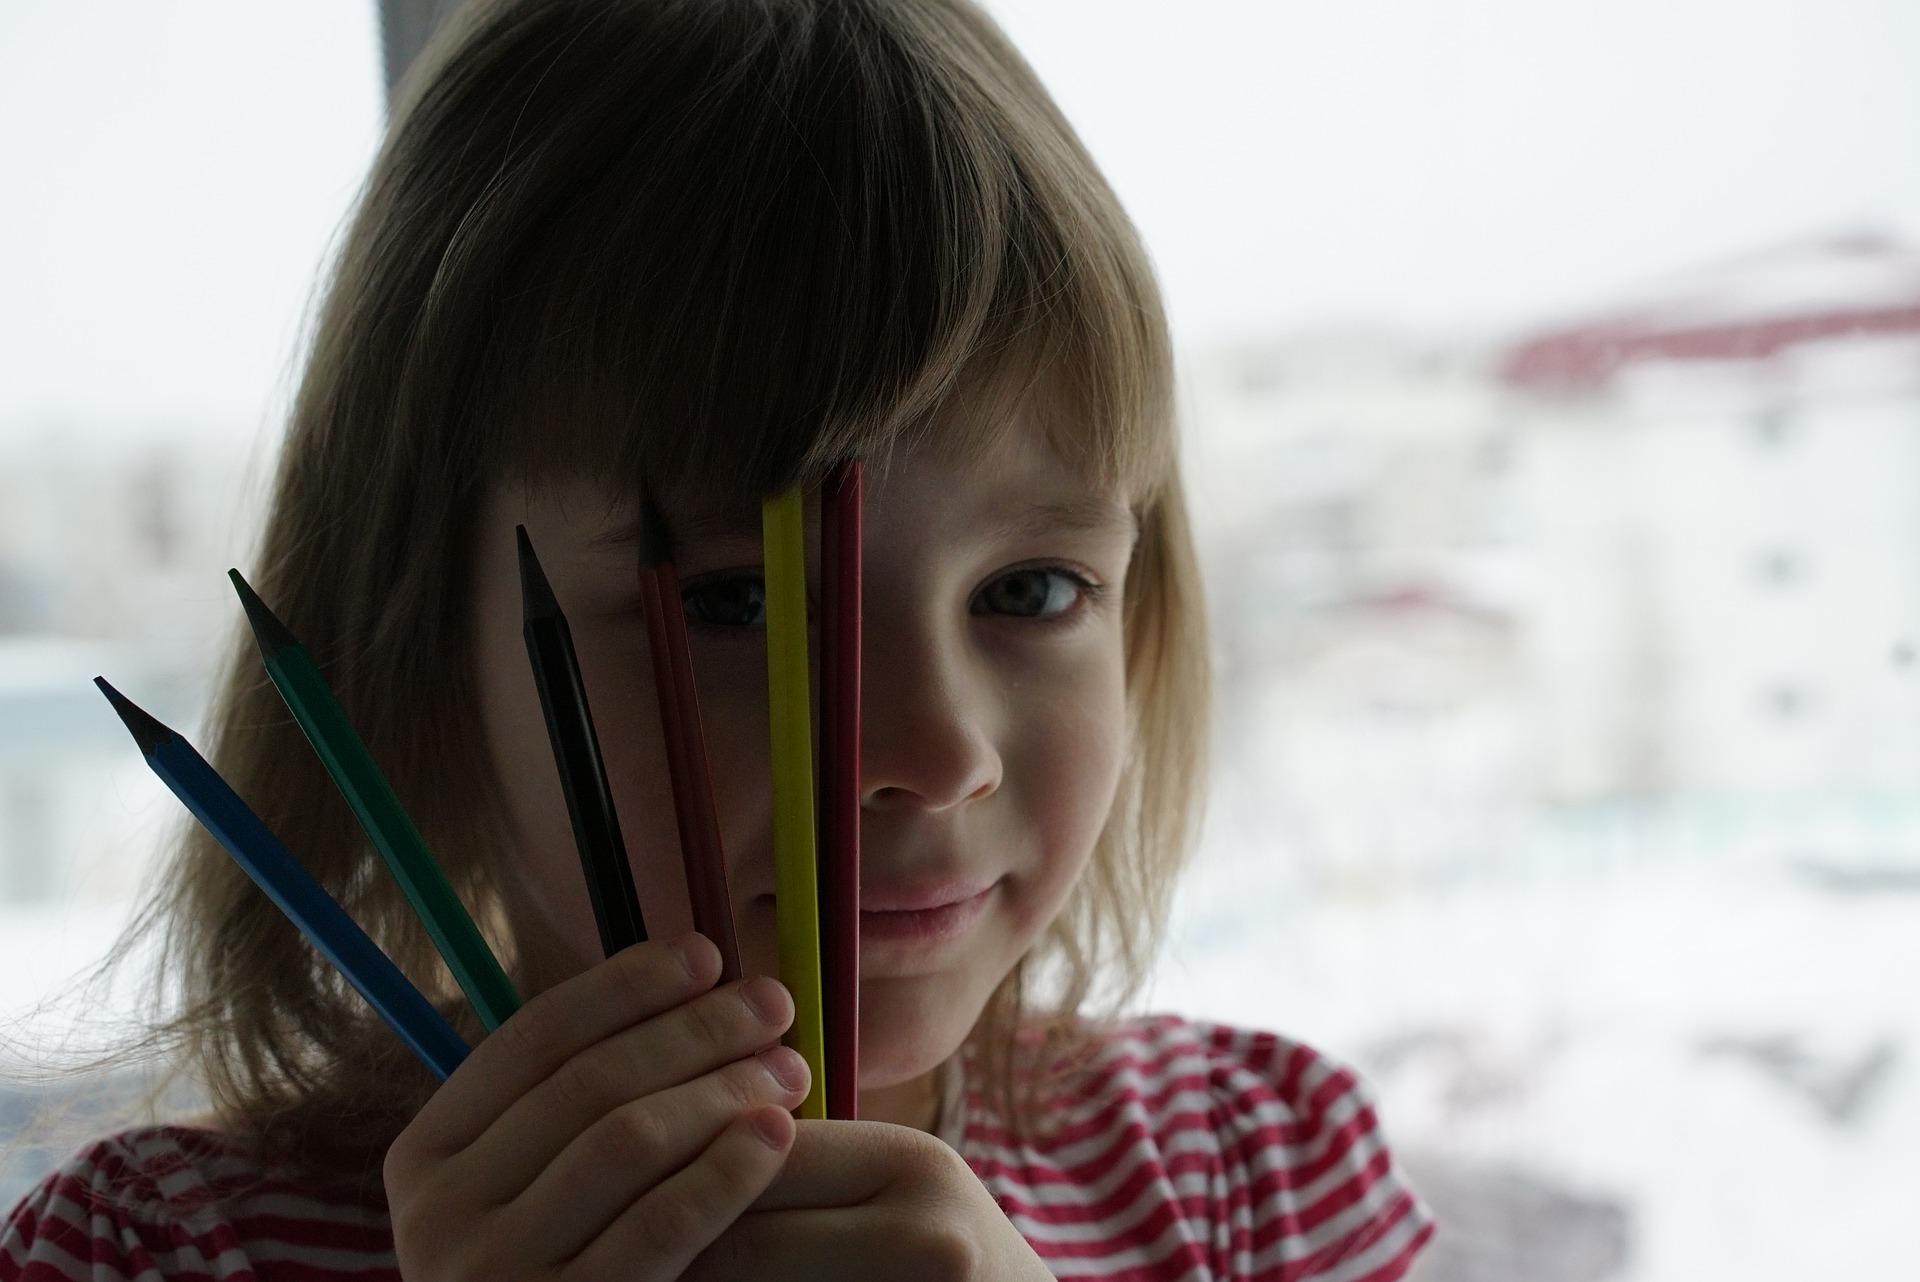 pencils-5443063_1920